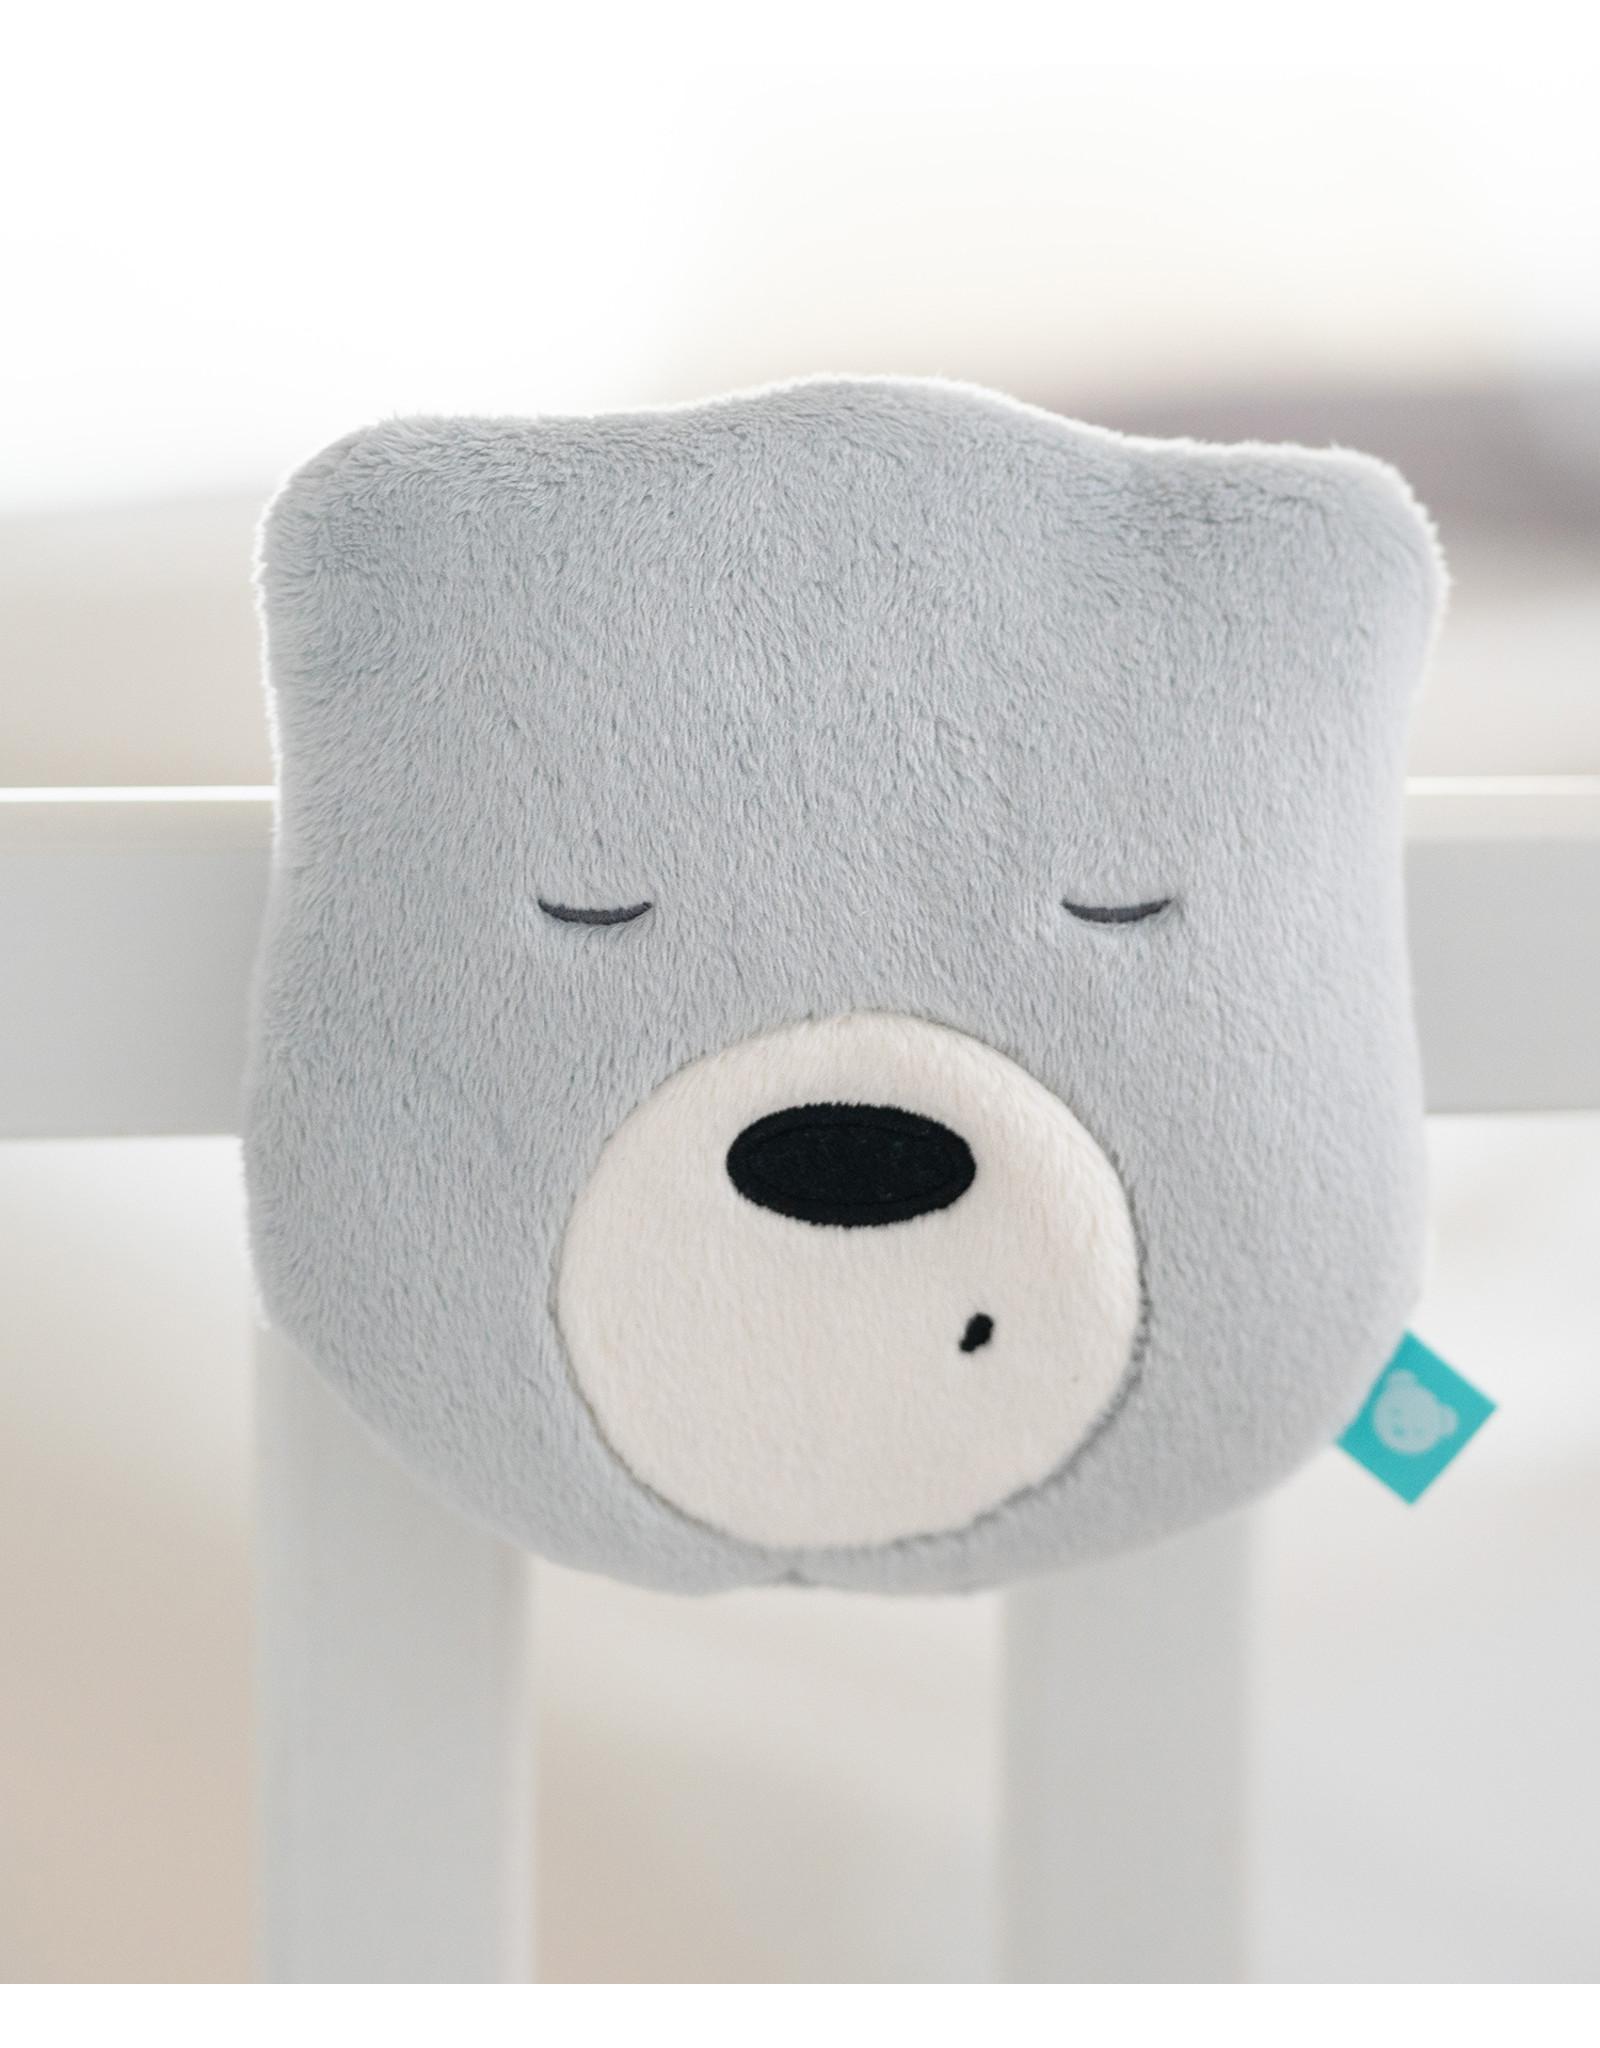 myHummy Mini Sleep Aid- Sleep Sensor Sensory Heart